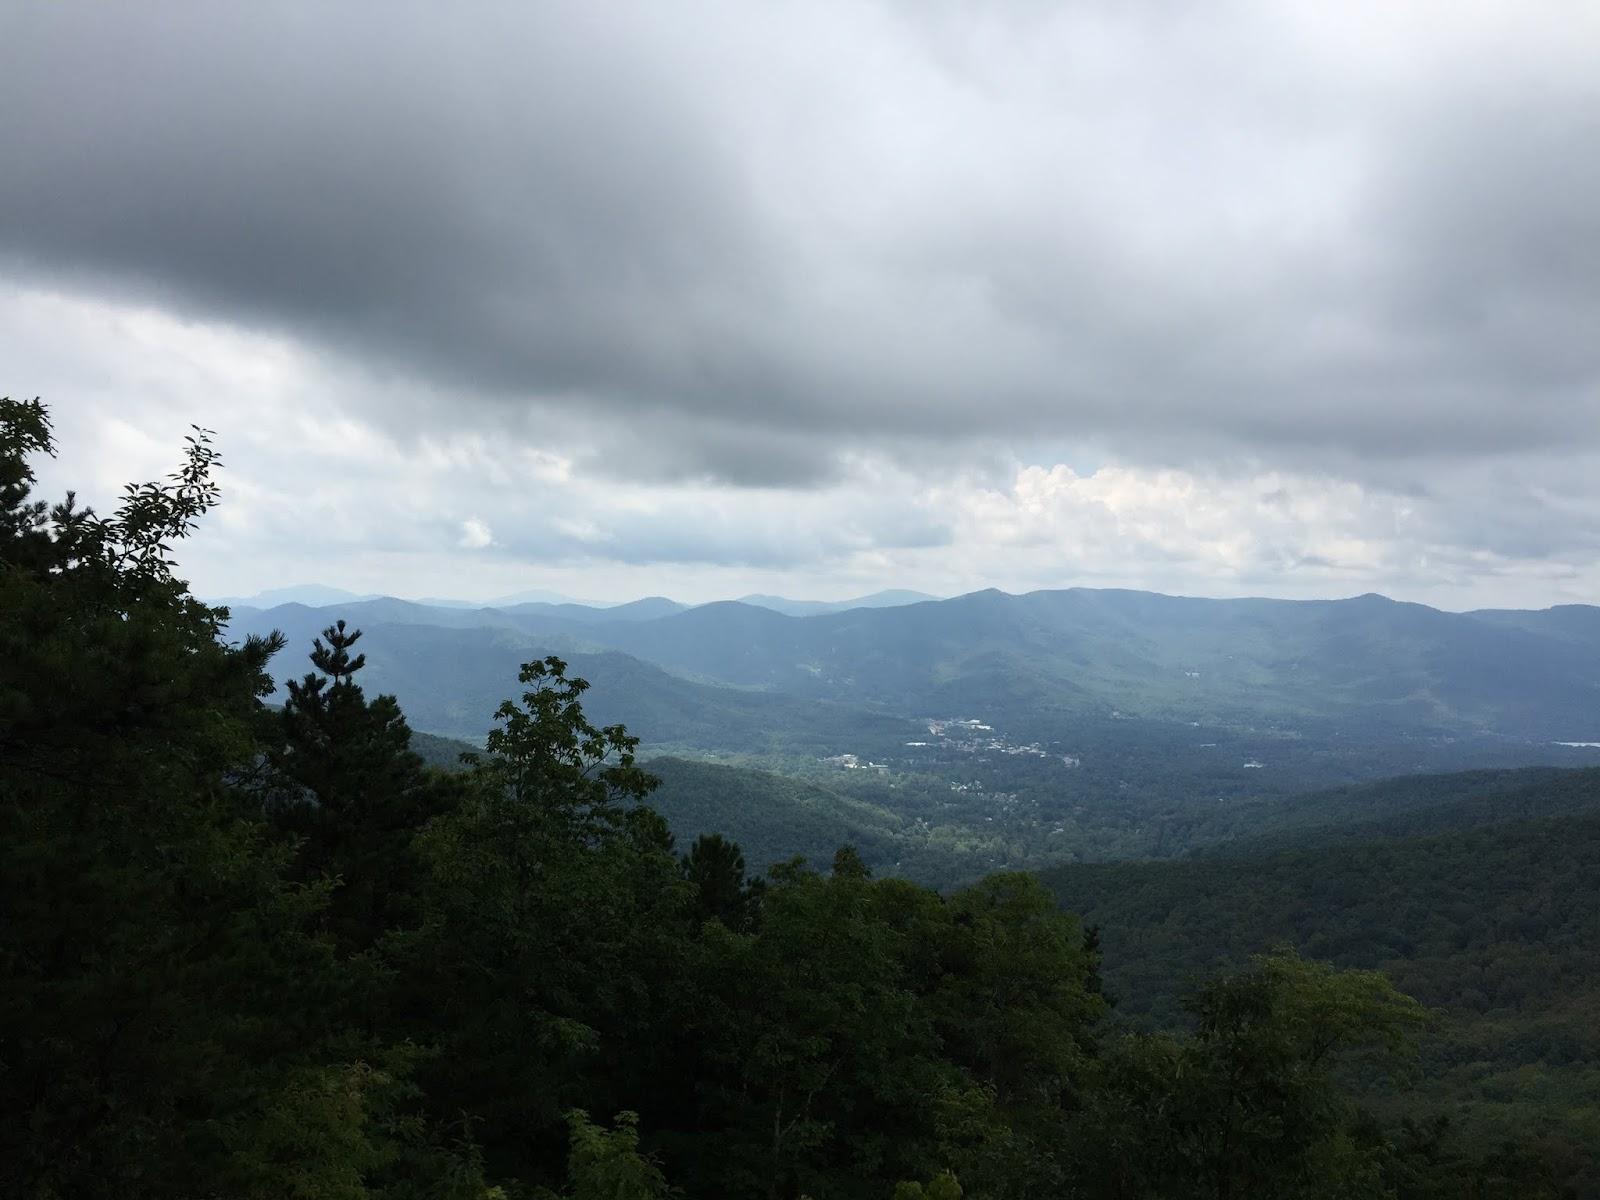 Big Piney Ridge